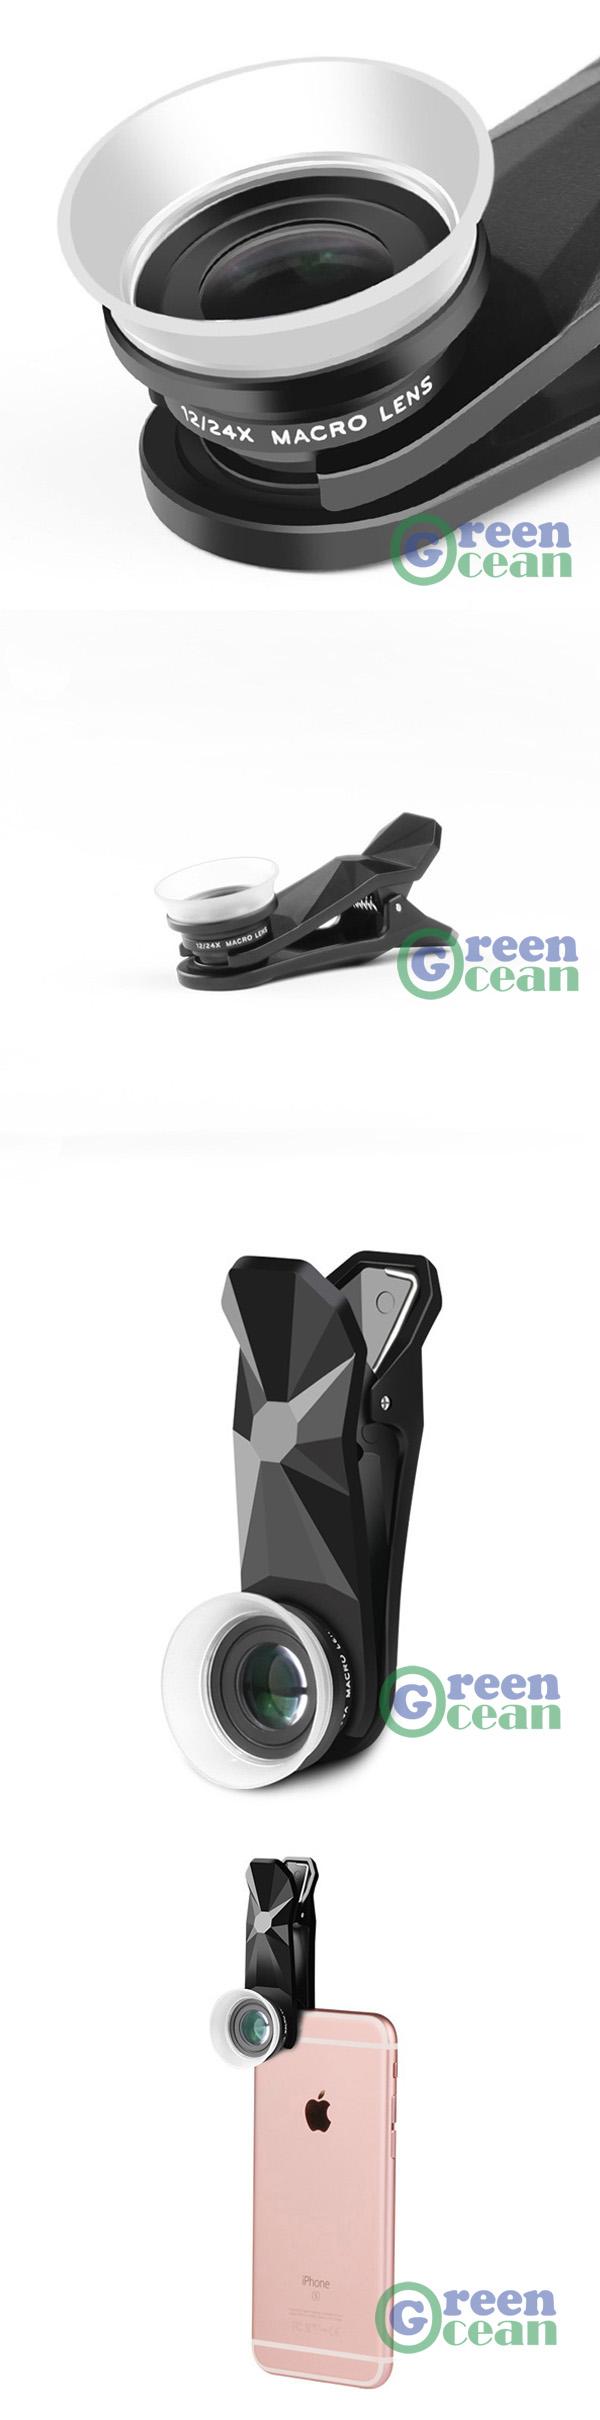 Universal Macro Photography Lenses 12-24X Super Macro Lens for Mobile Phones